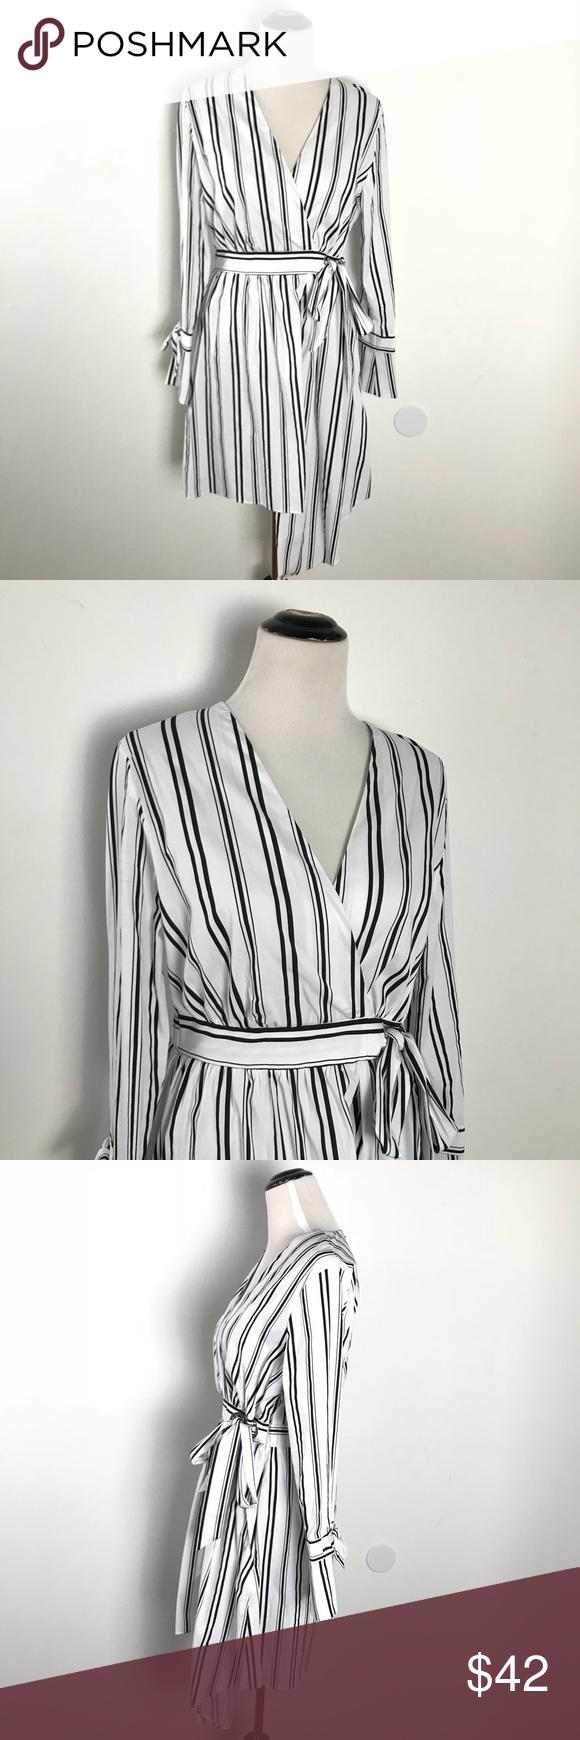 036becf20f1 Black And White Shirt Dress River Island – EDGE Engineering and ...